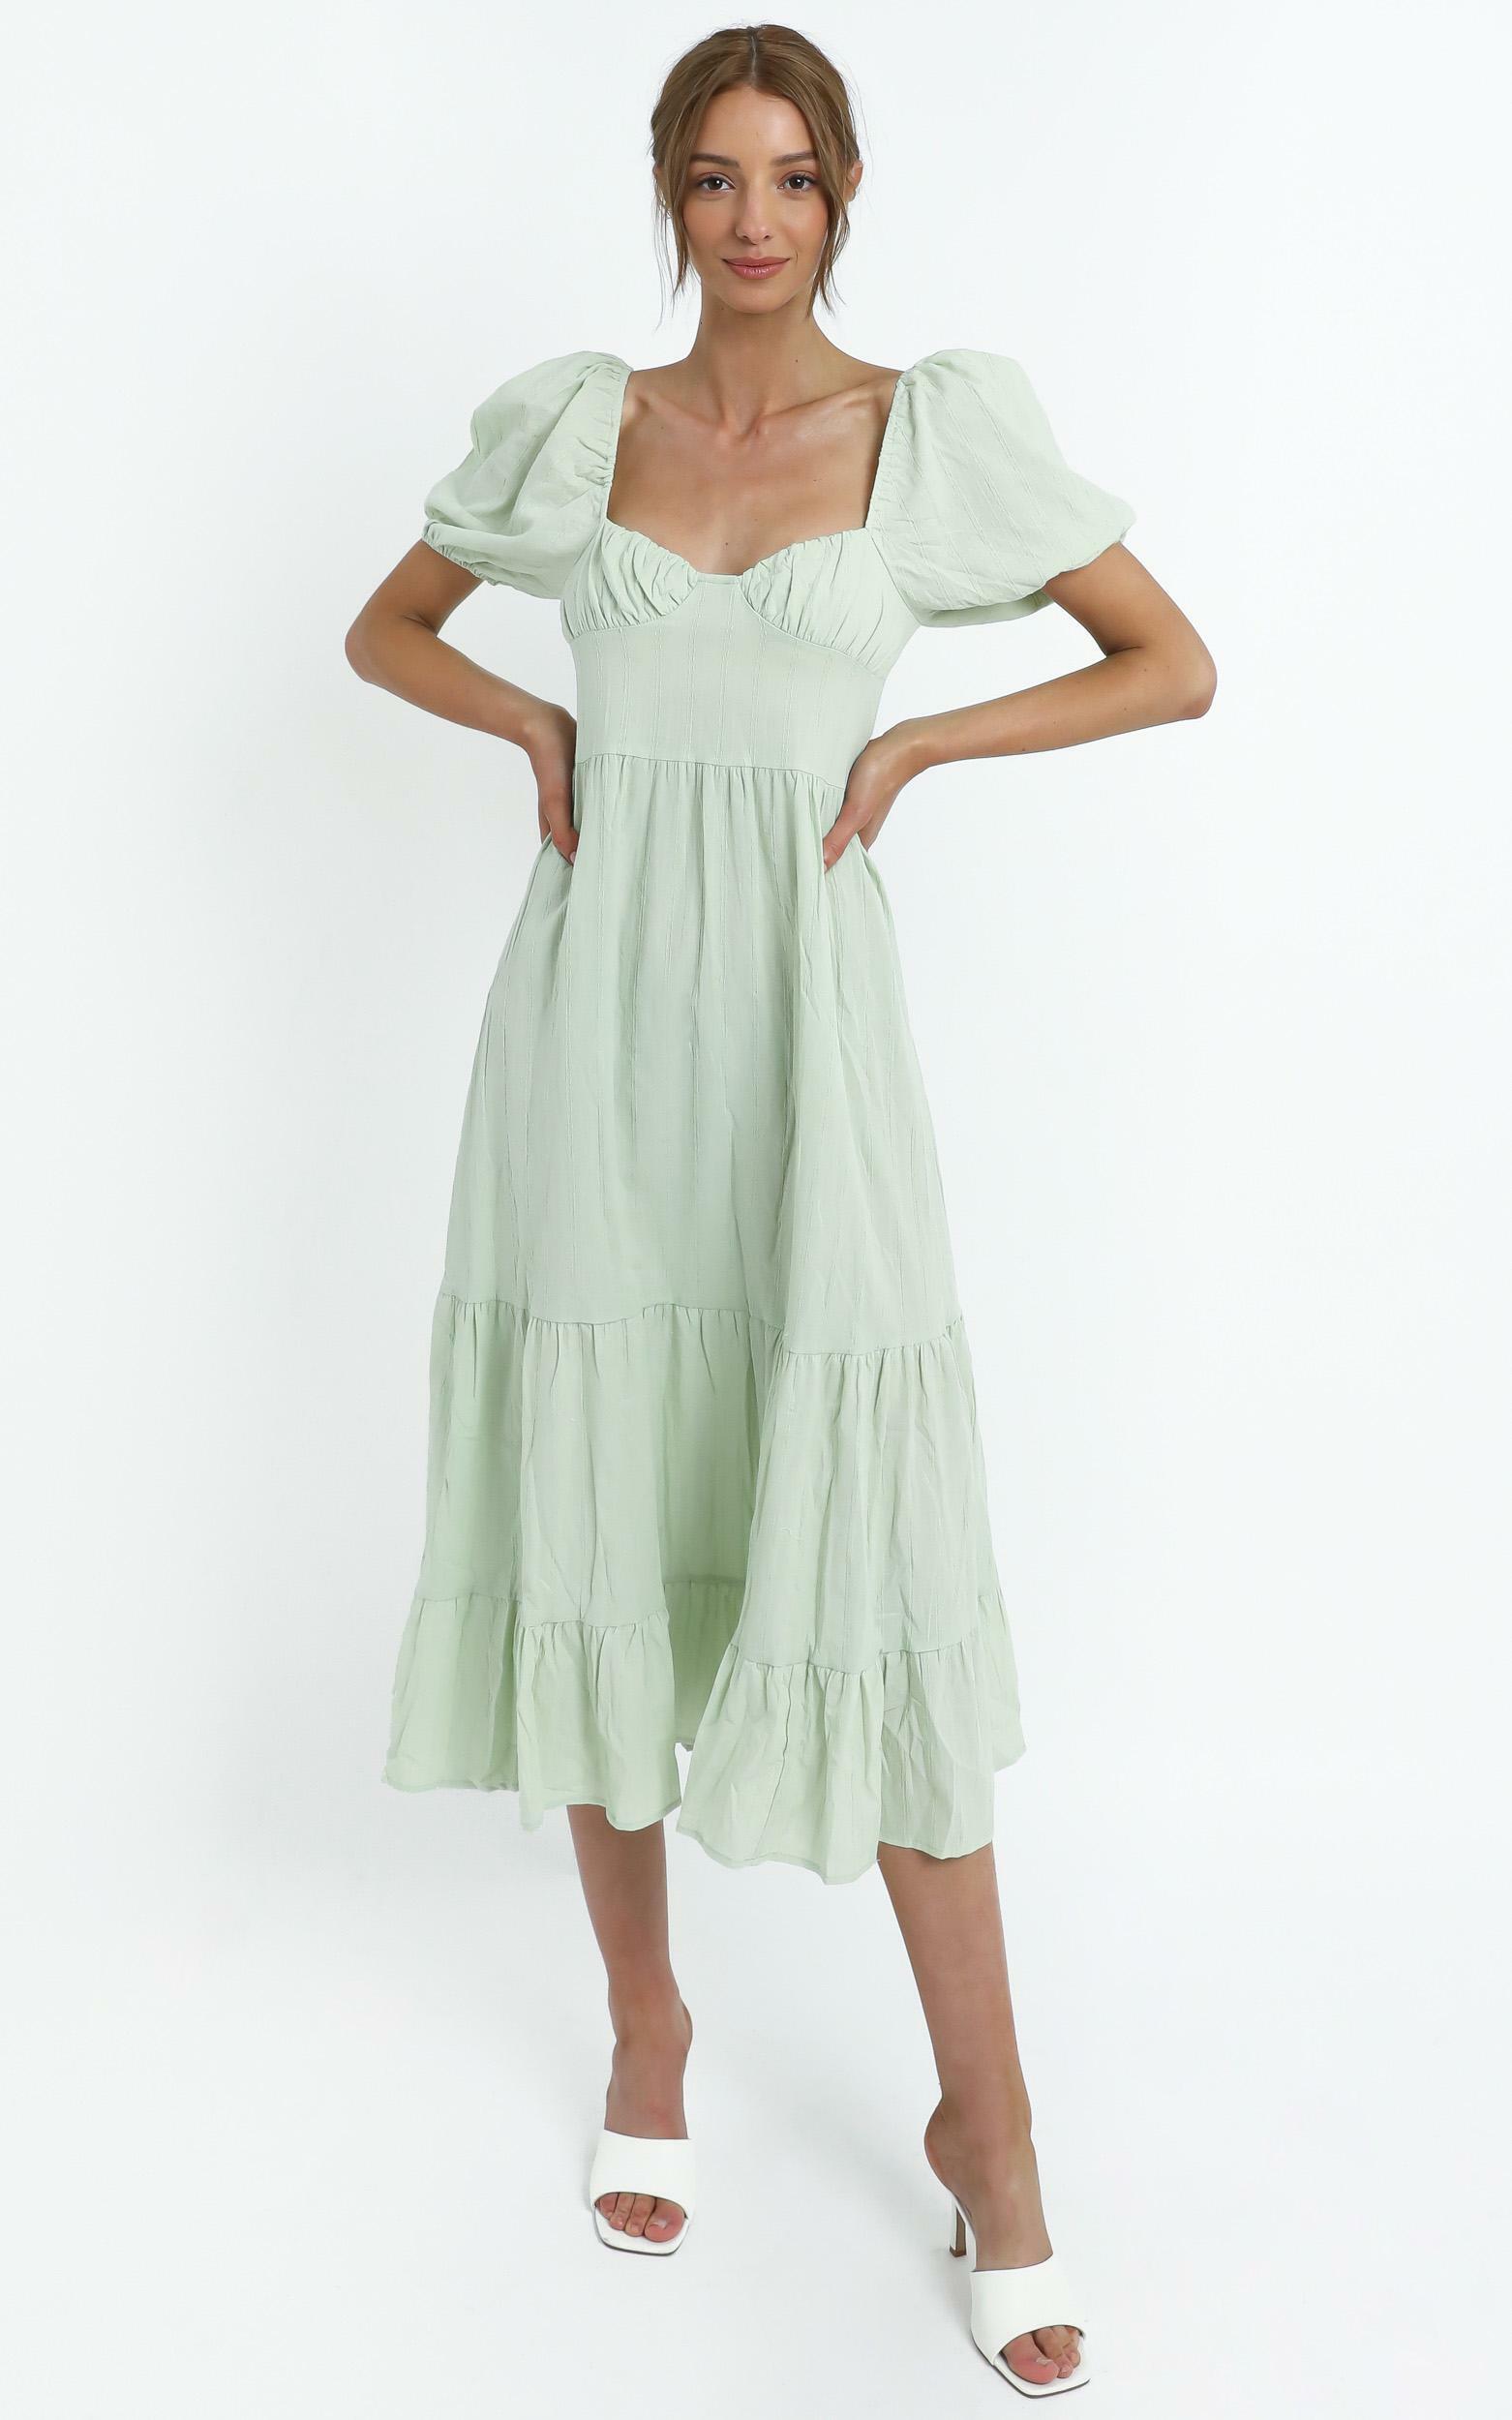 Preston Dress in Sage - 14 (XL), GRN1, hi-res image number null